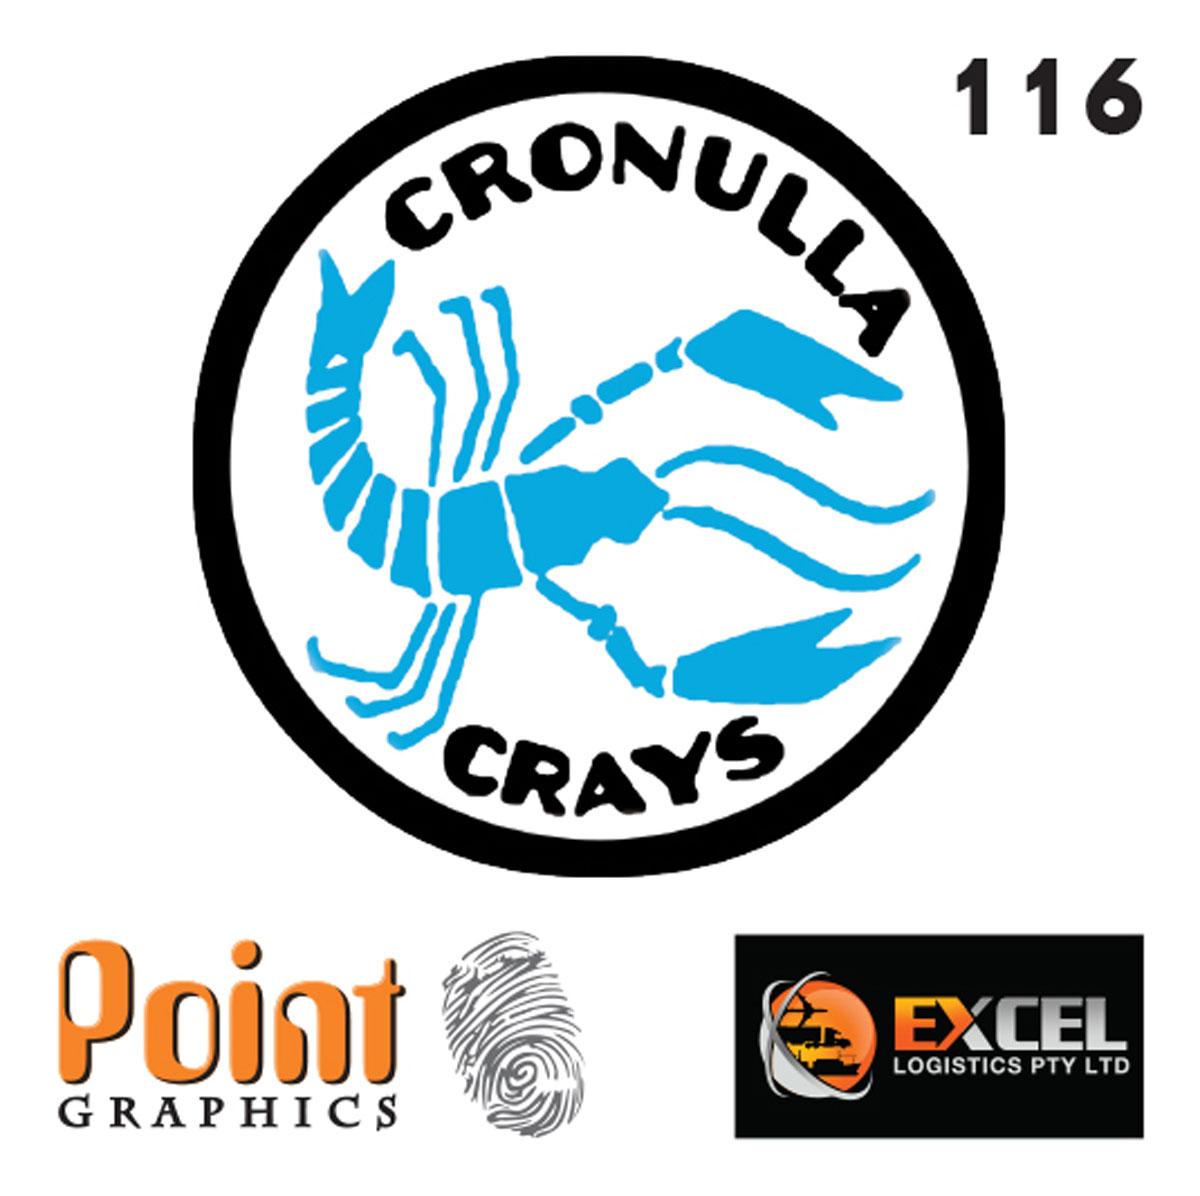 Cronulla Crays Board